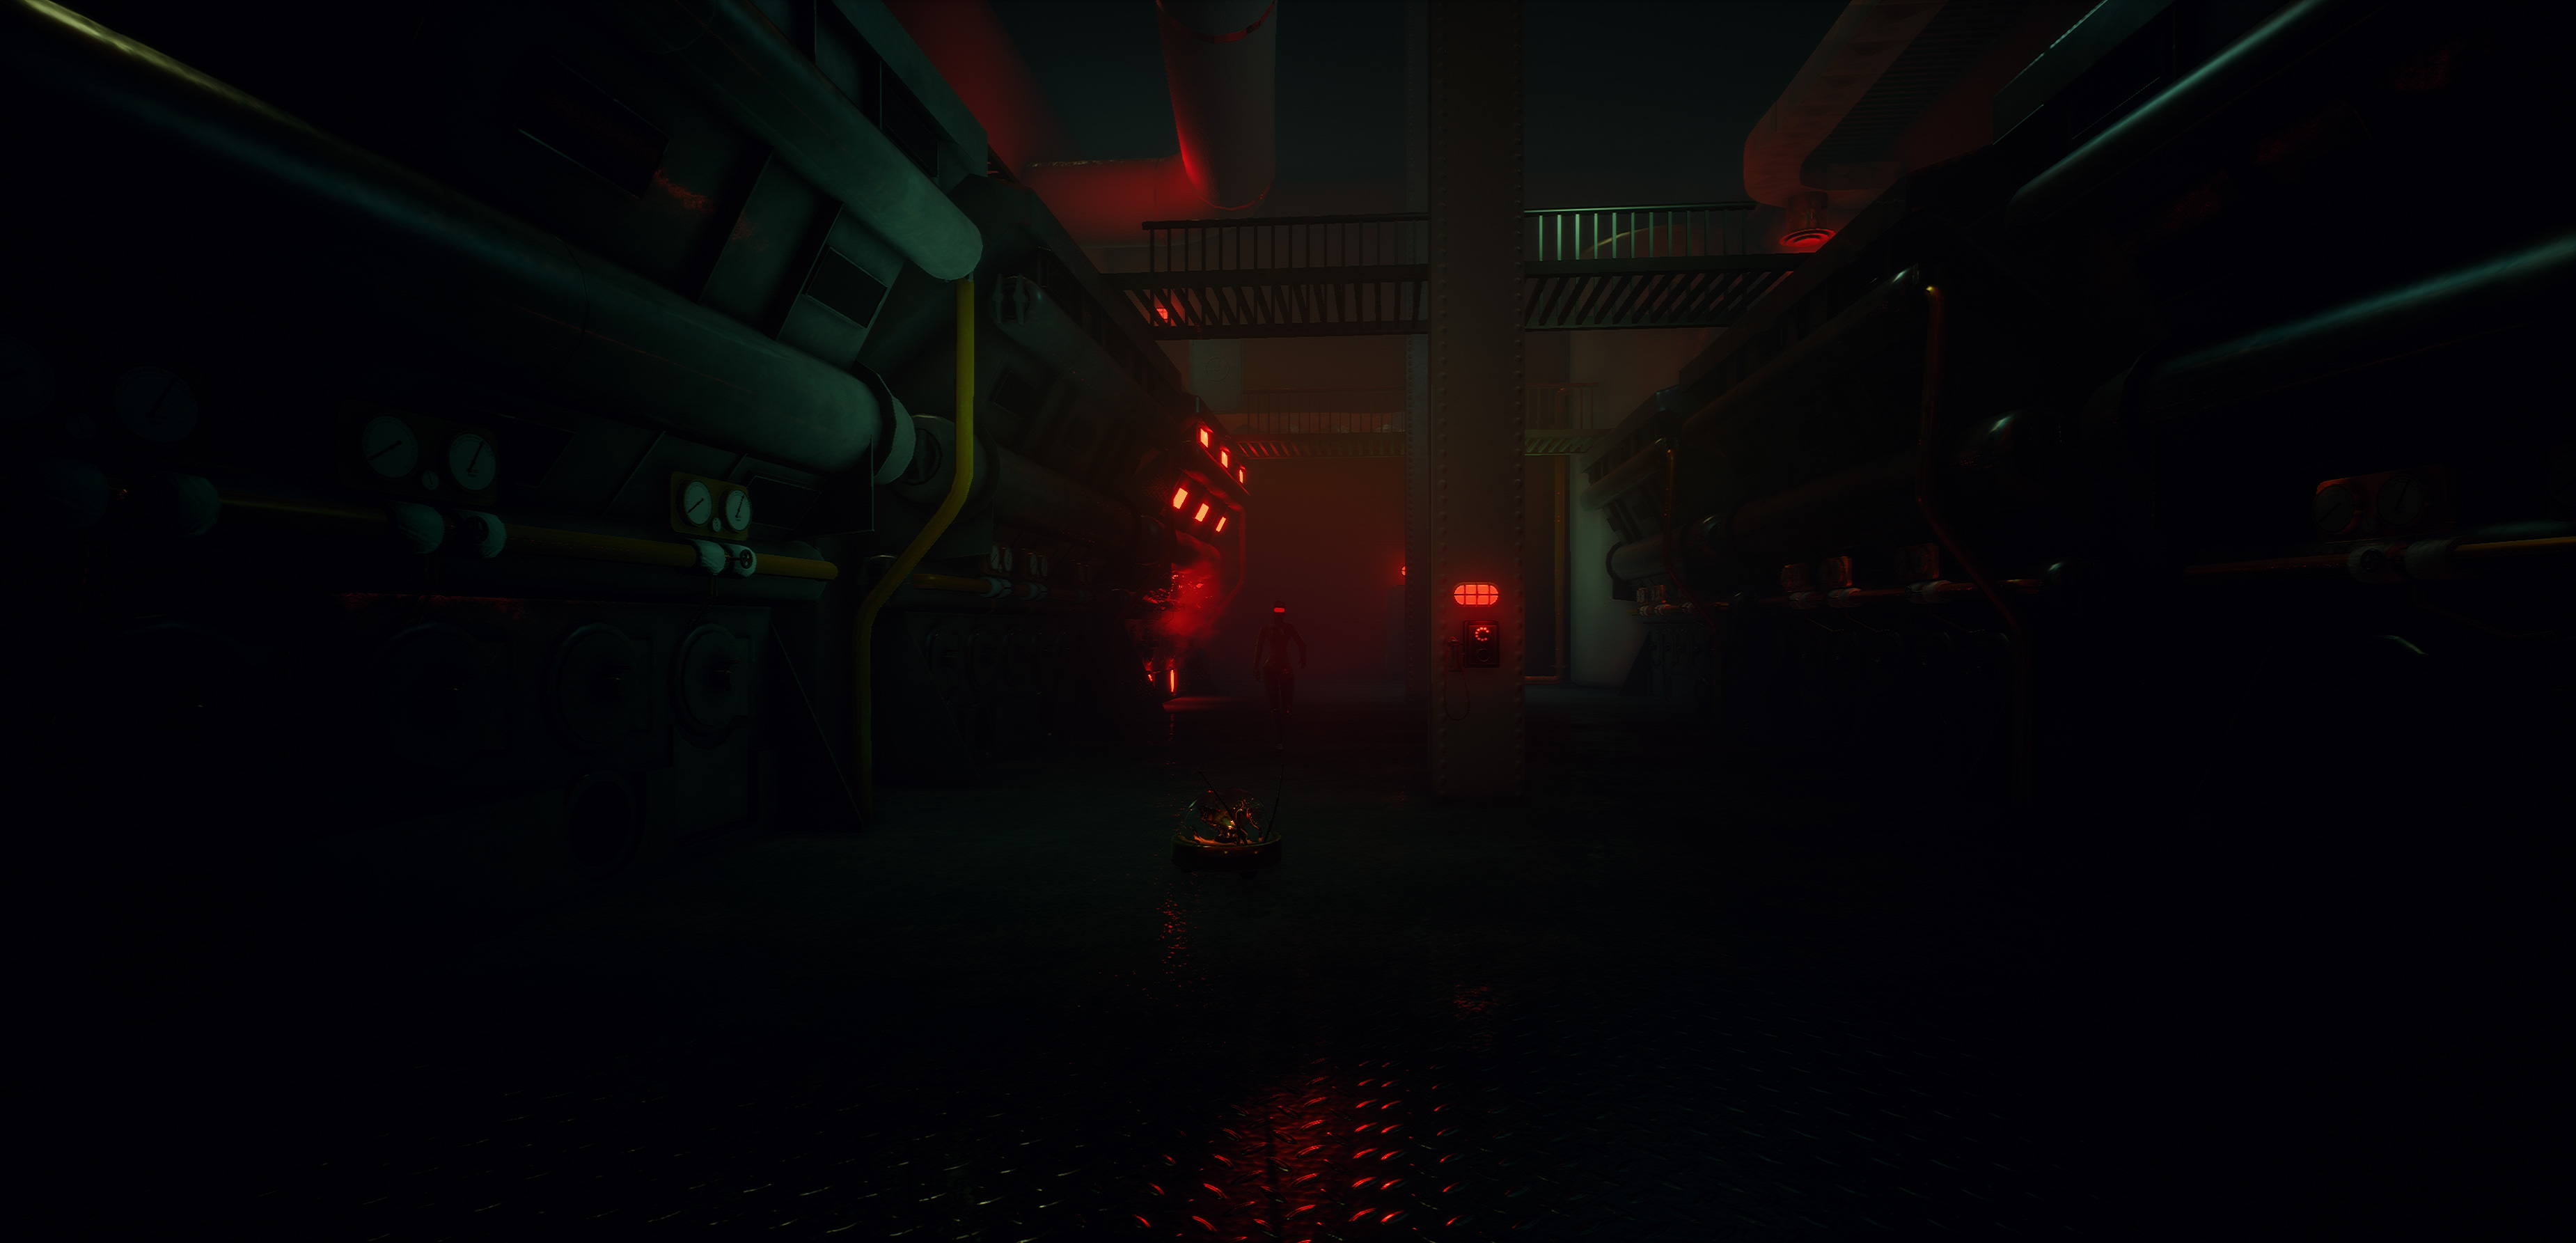 TechnoTsunami Boiler Room 8